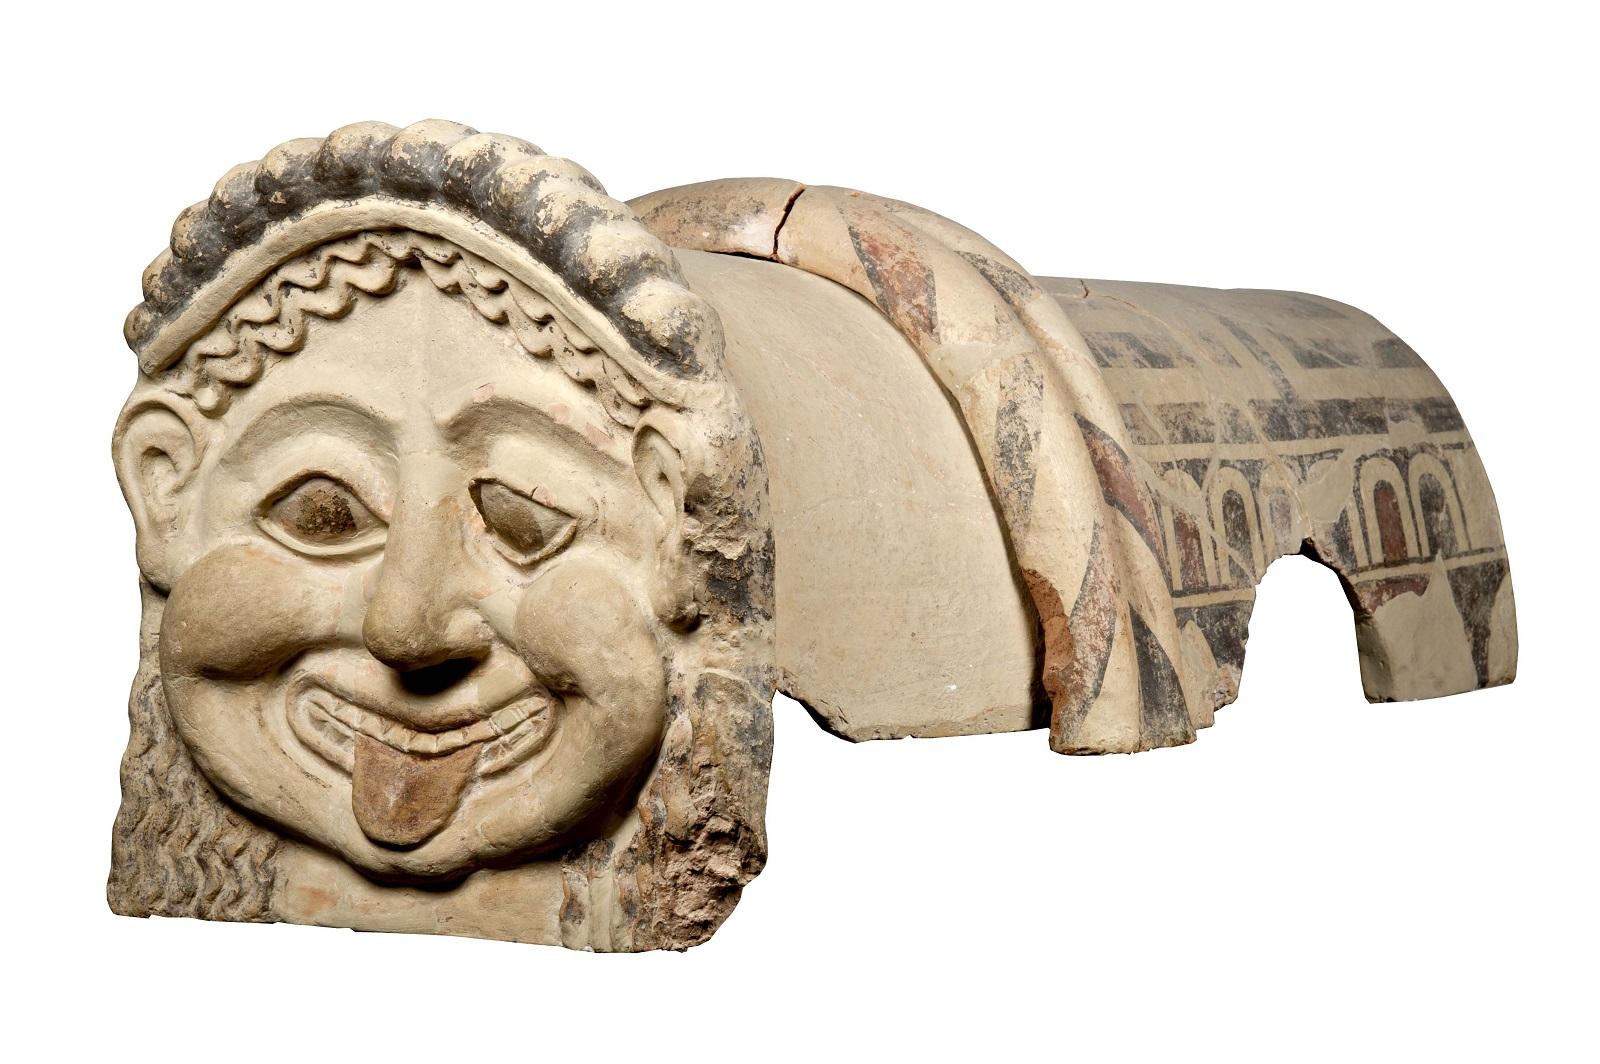 Gorgon Antefix Terracotta dak-ornament met het hoofd van een gorgon, Gela, Sicilië, c.500 BC Museo Archeologico Regionale Di Agrigento © Regione Siciliana